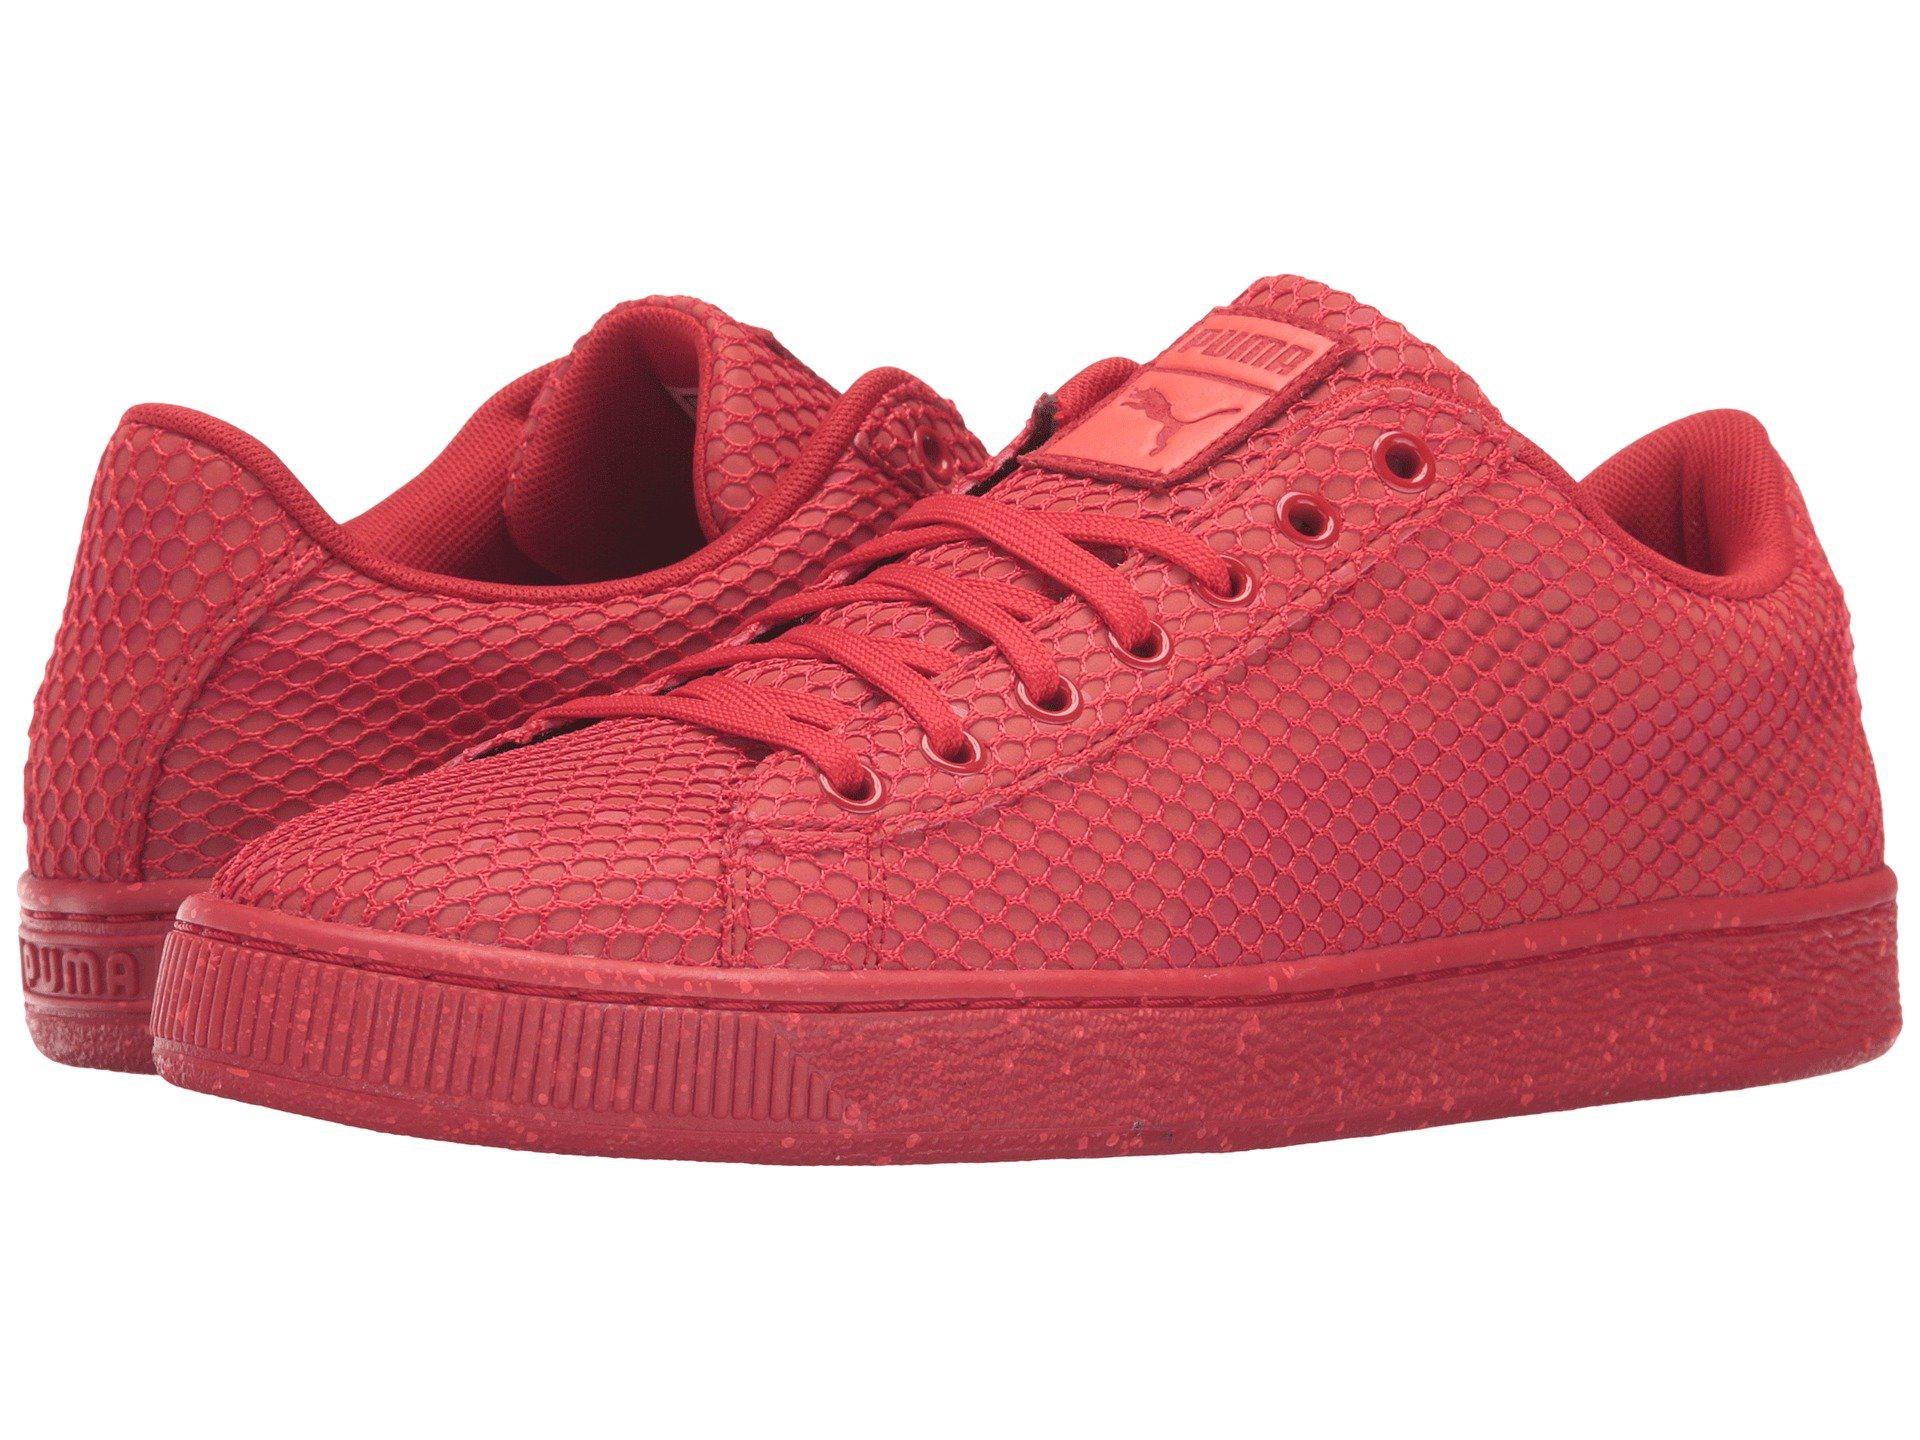 puma basket classic night camo red